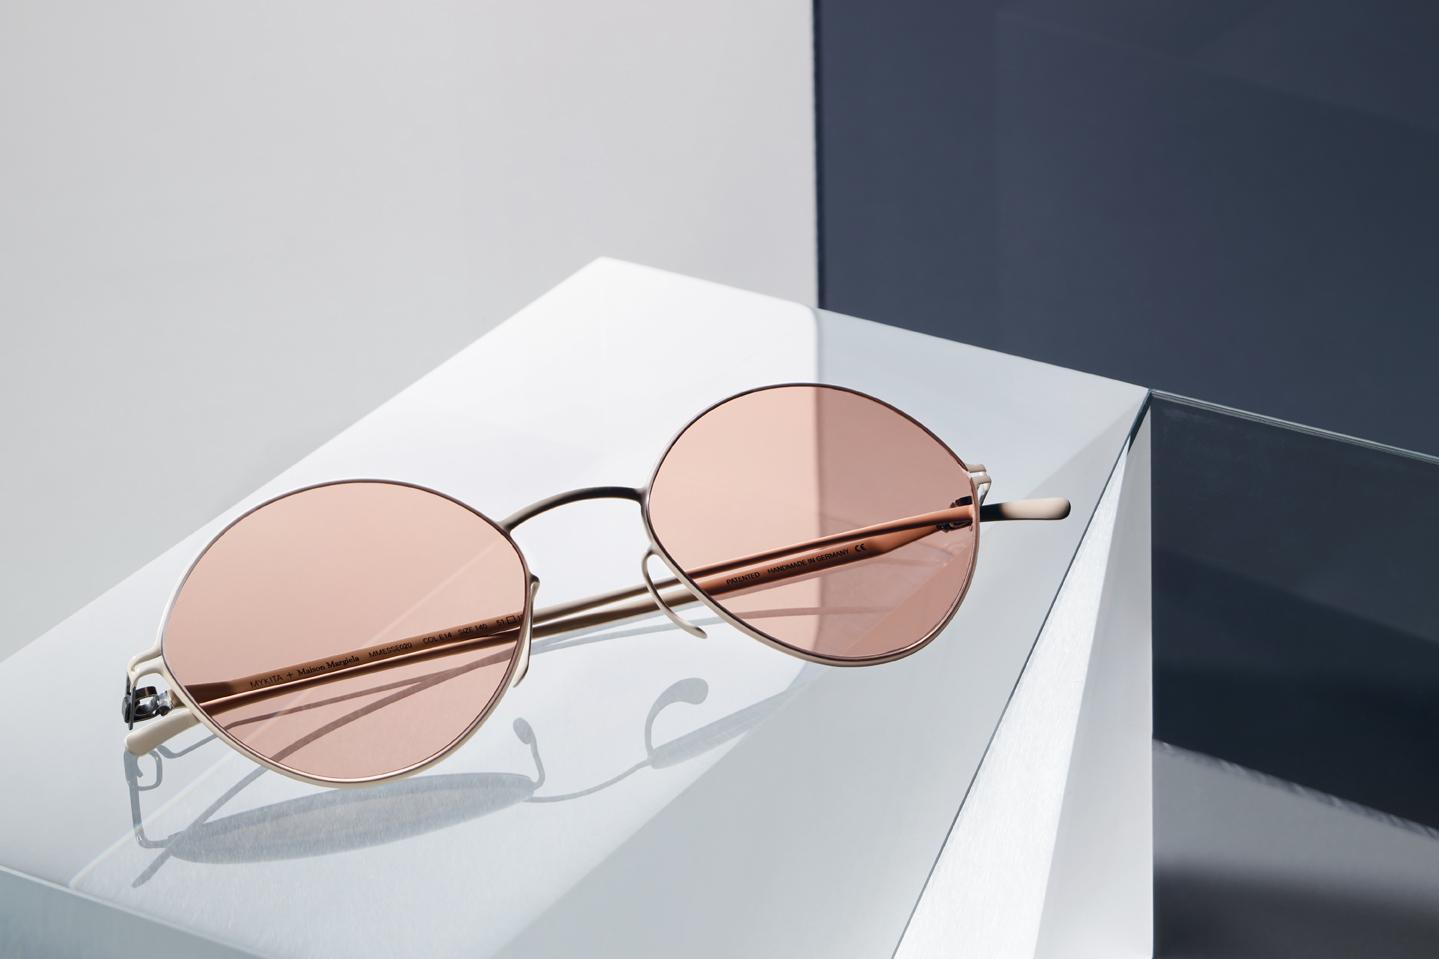 Opticalnet MYKITA Maison Margiela 2018 12